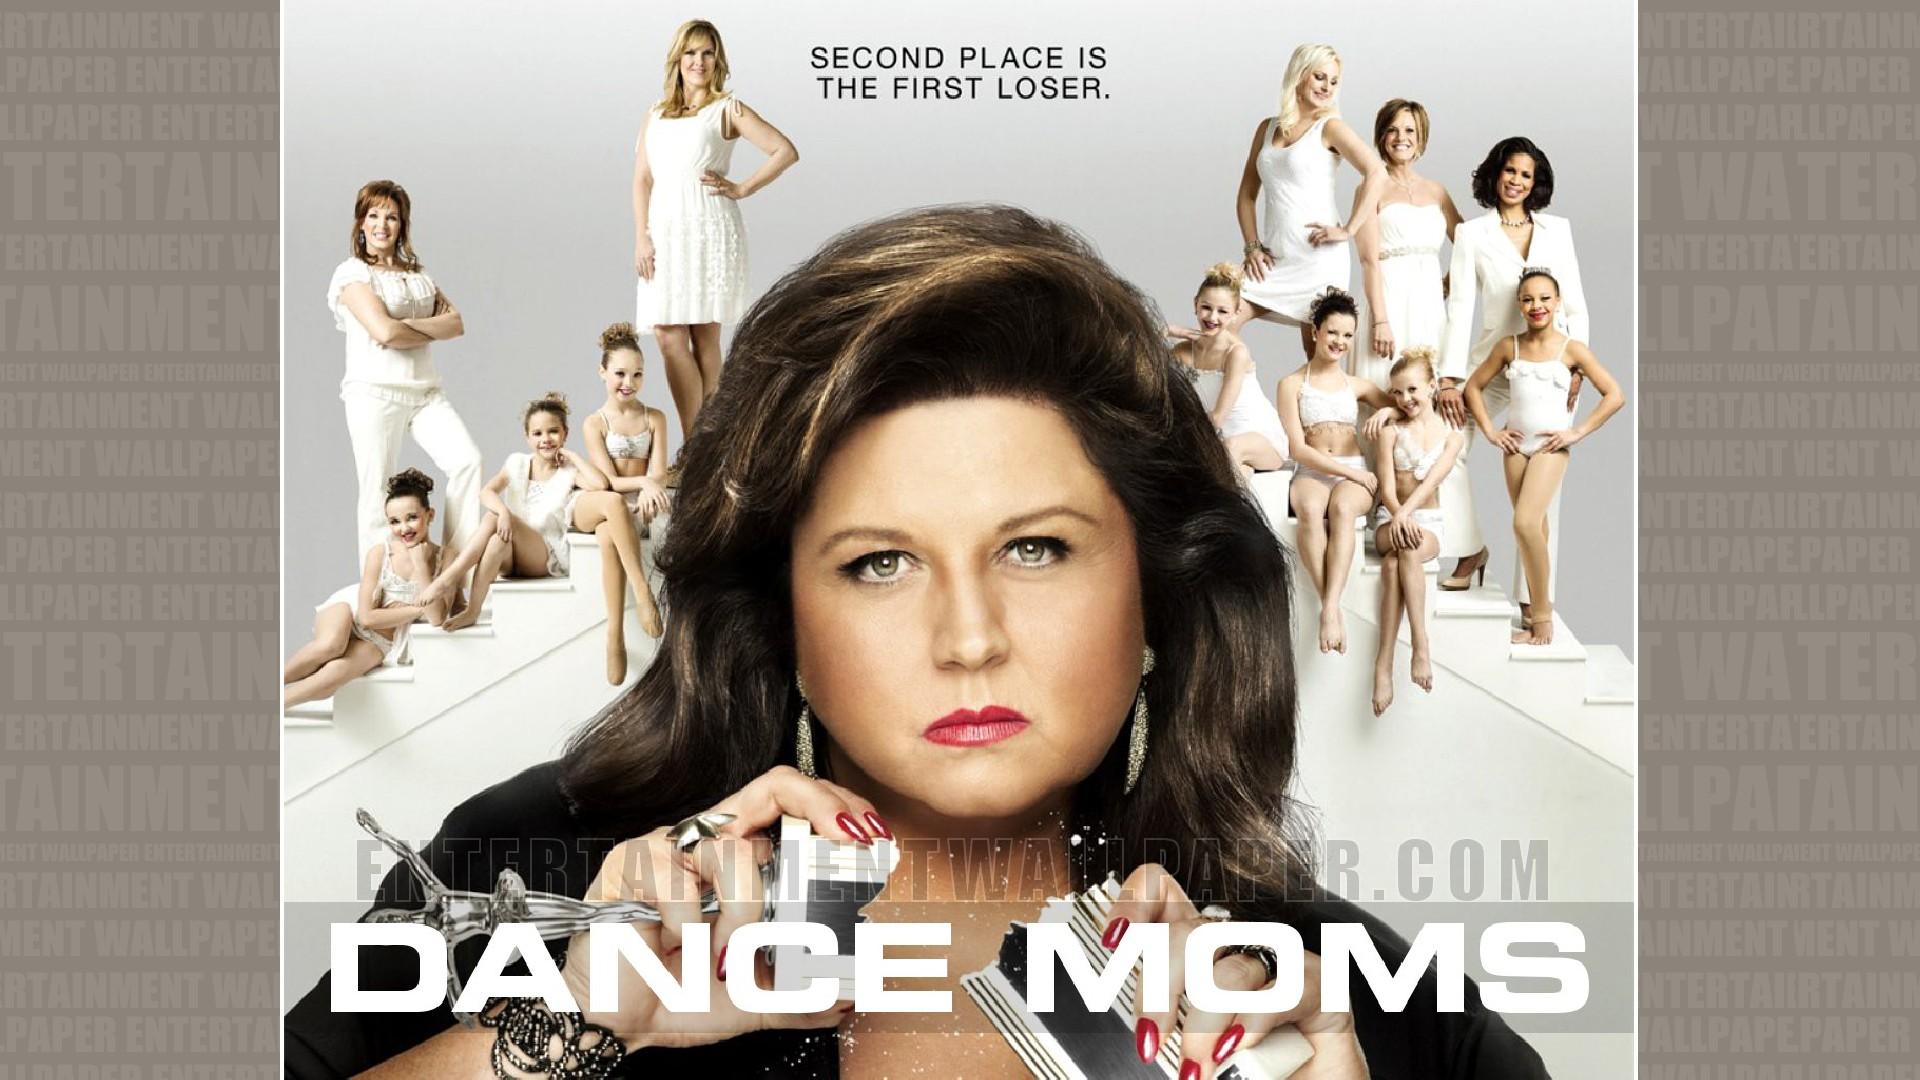 dance moms wallpaper 20032969 size 1920x1080 more dance moms wallpaper 1920x1080